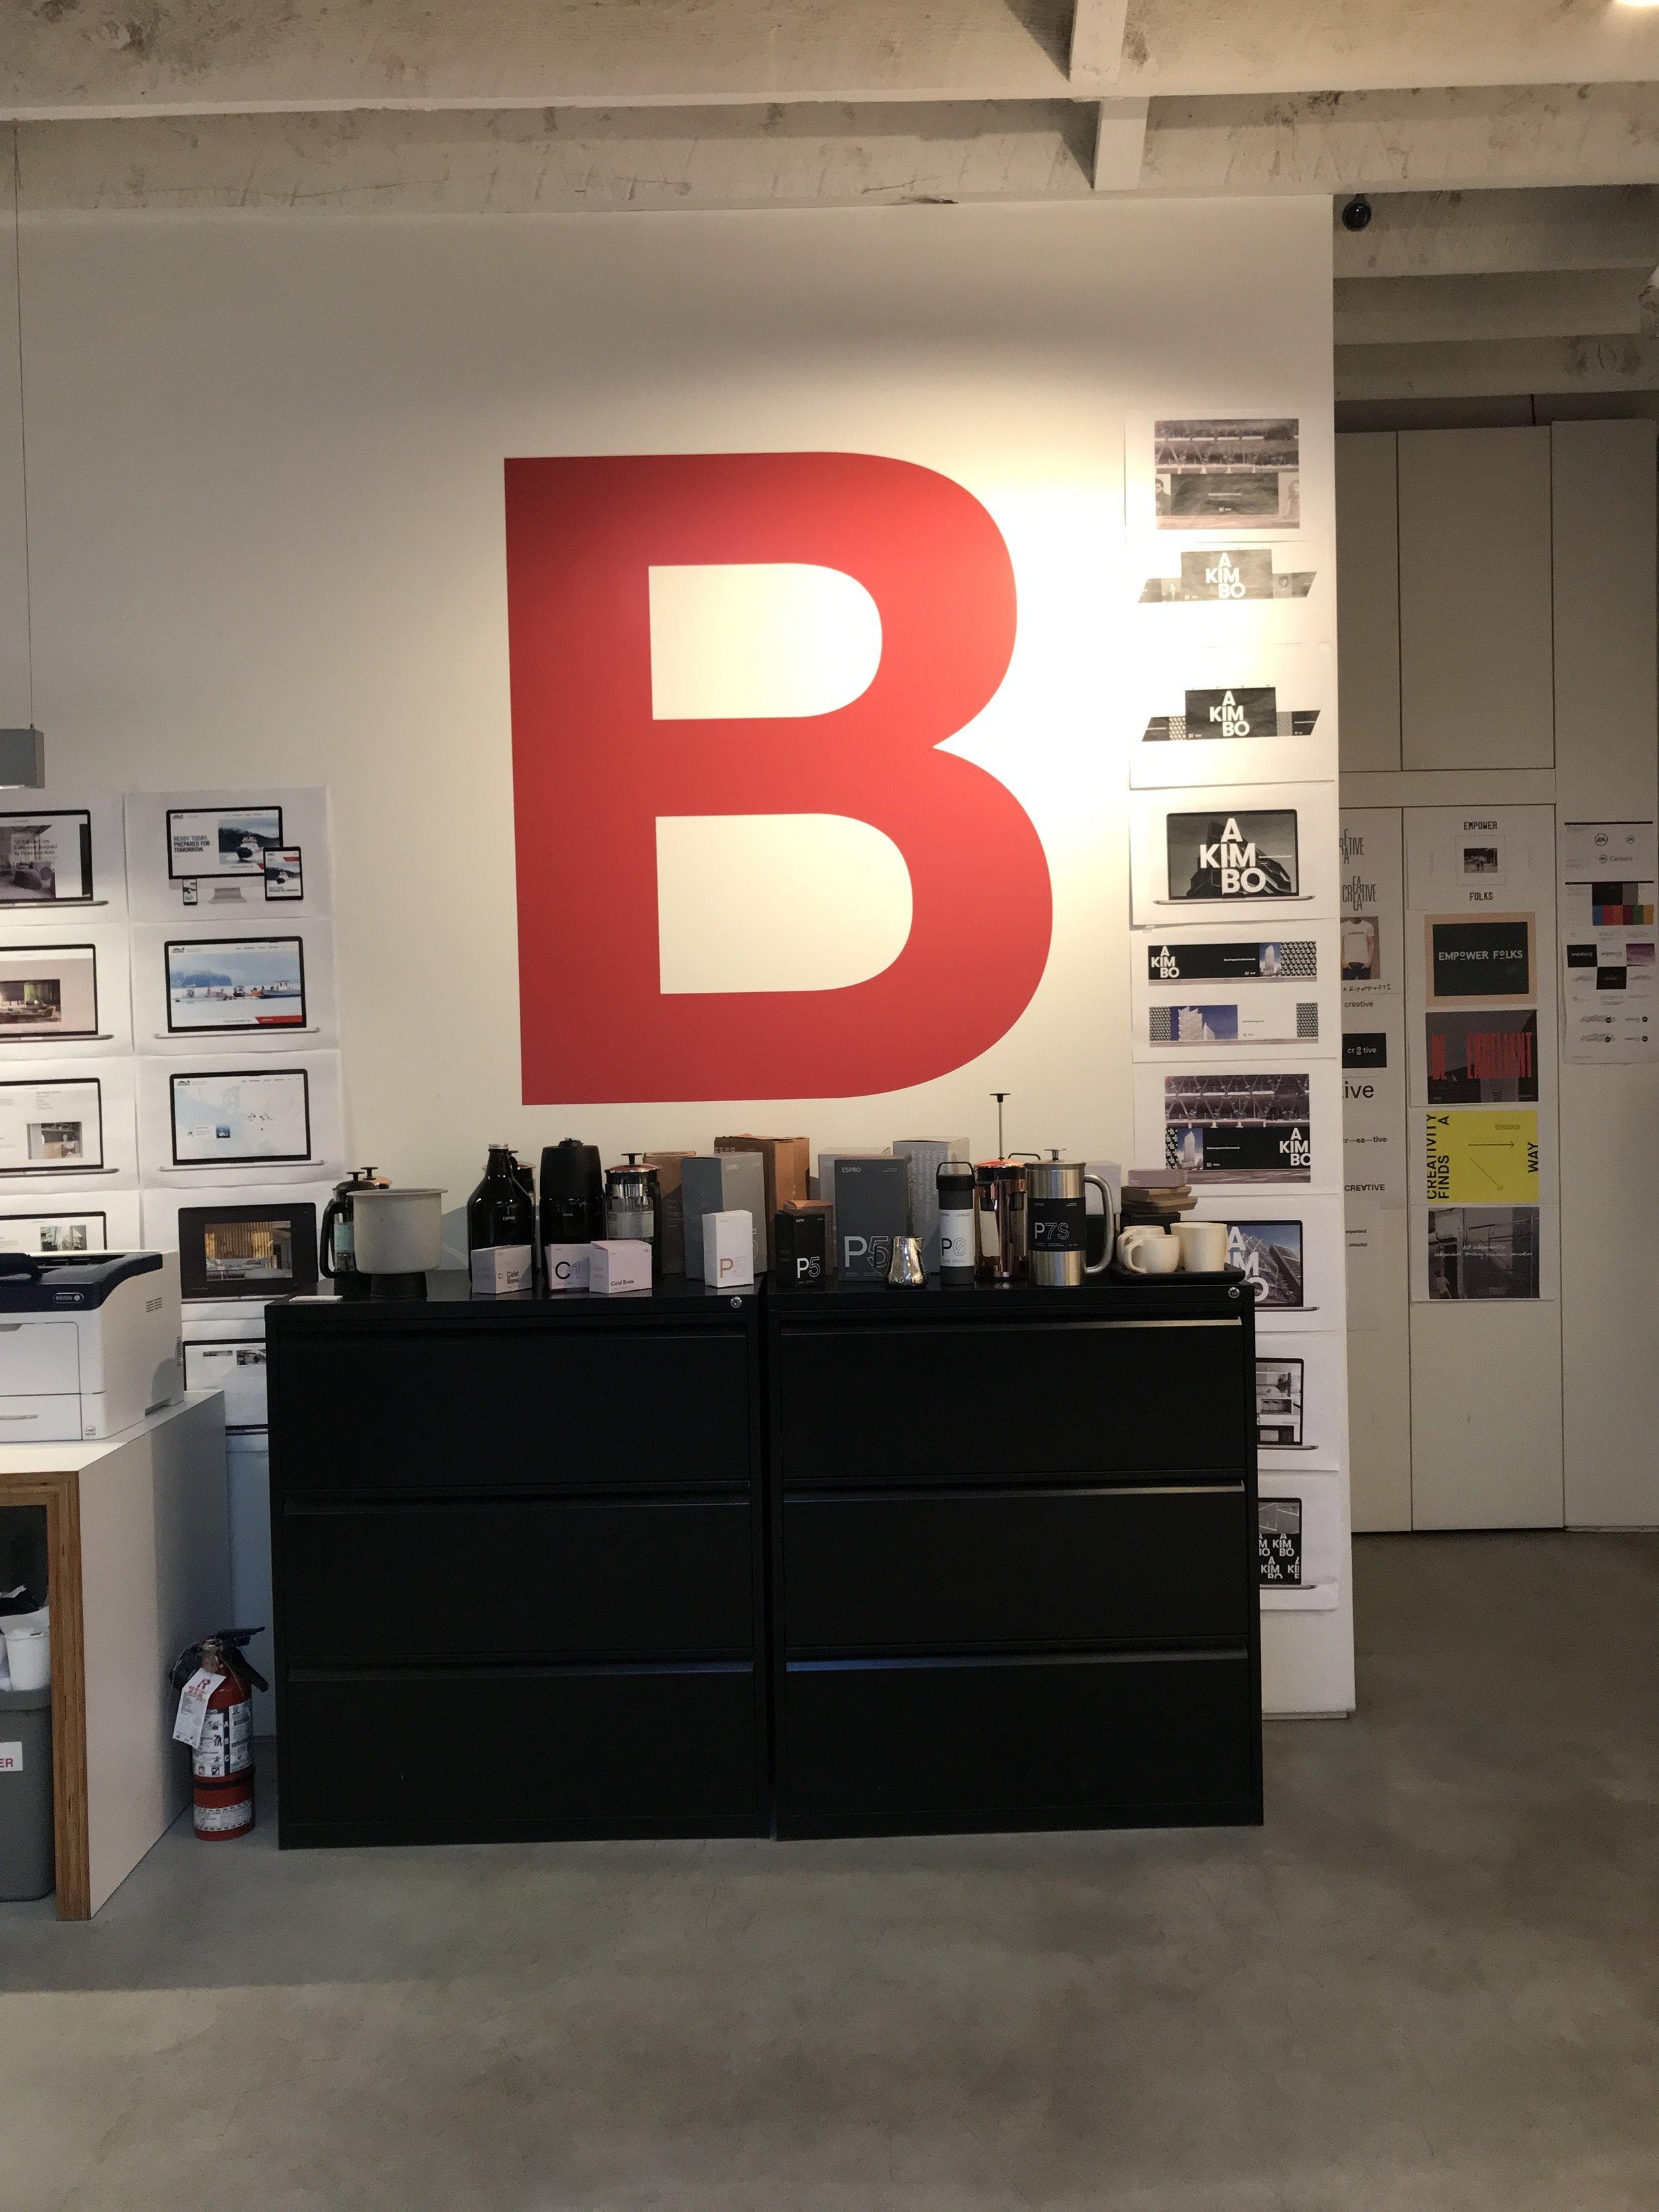 Coffee pot prototypes lying around at the Burnkit studio.